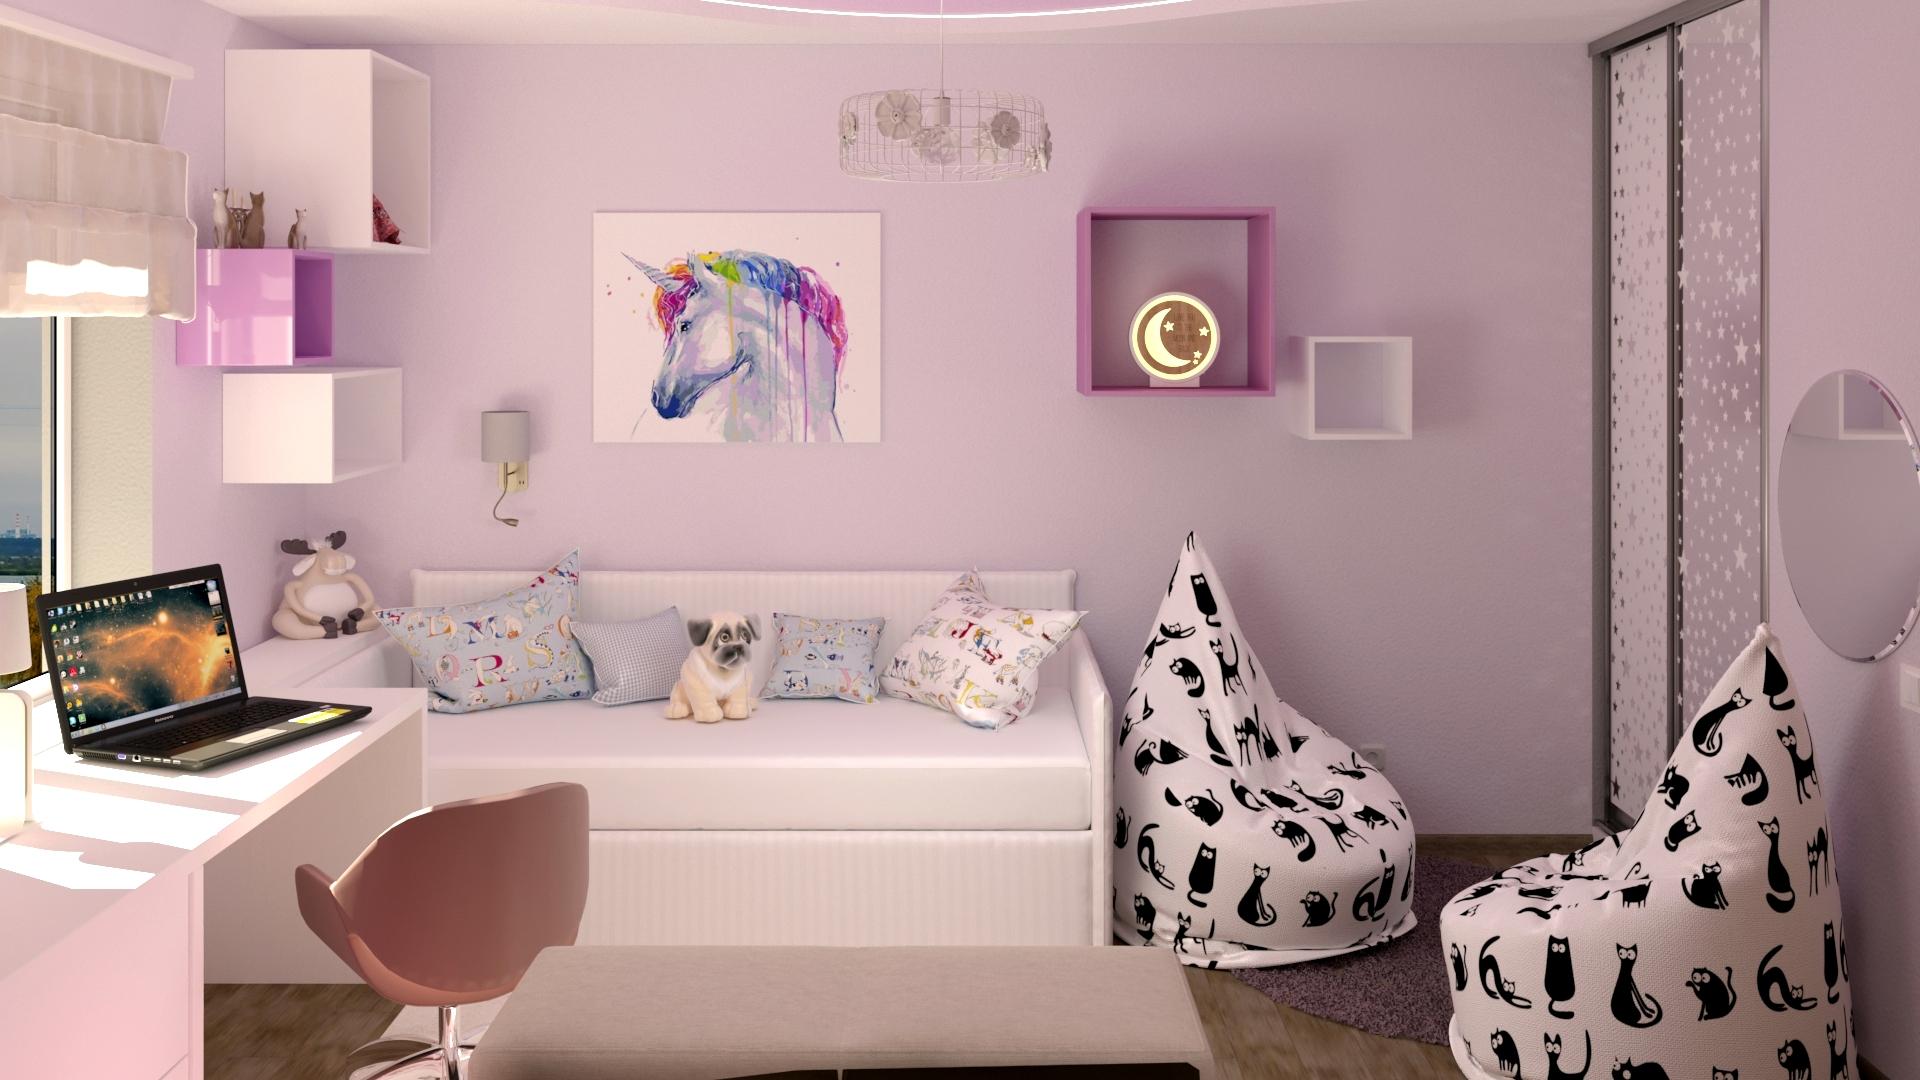 Children's room for the girl in 3d max corona render image